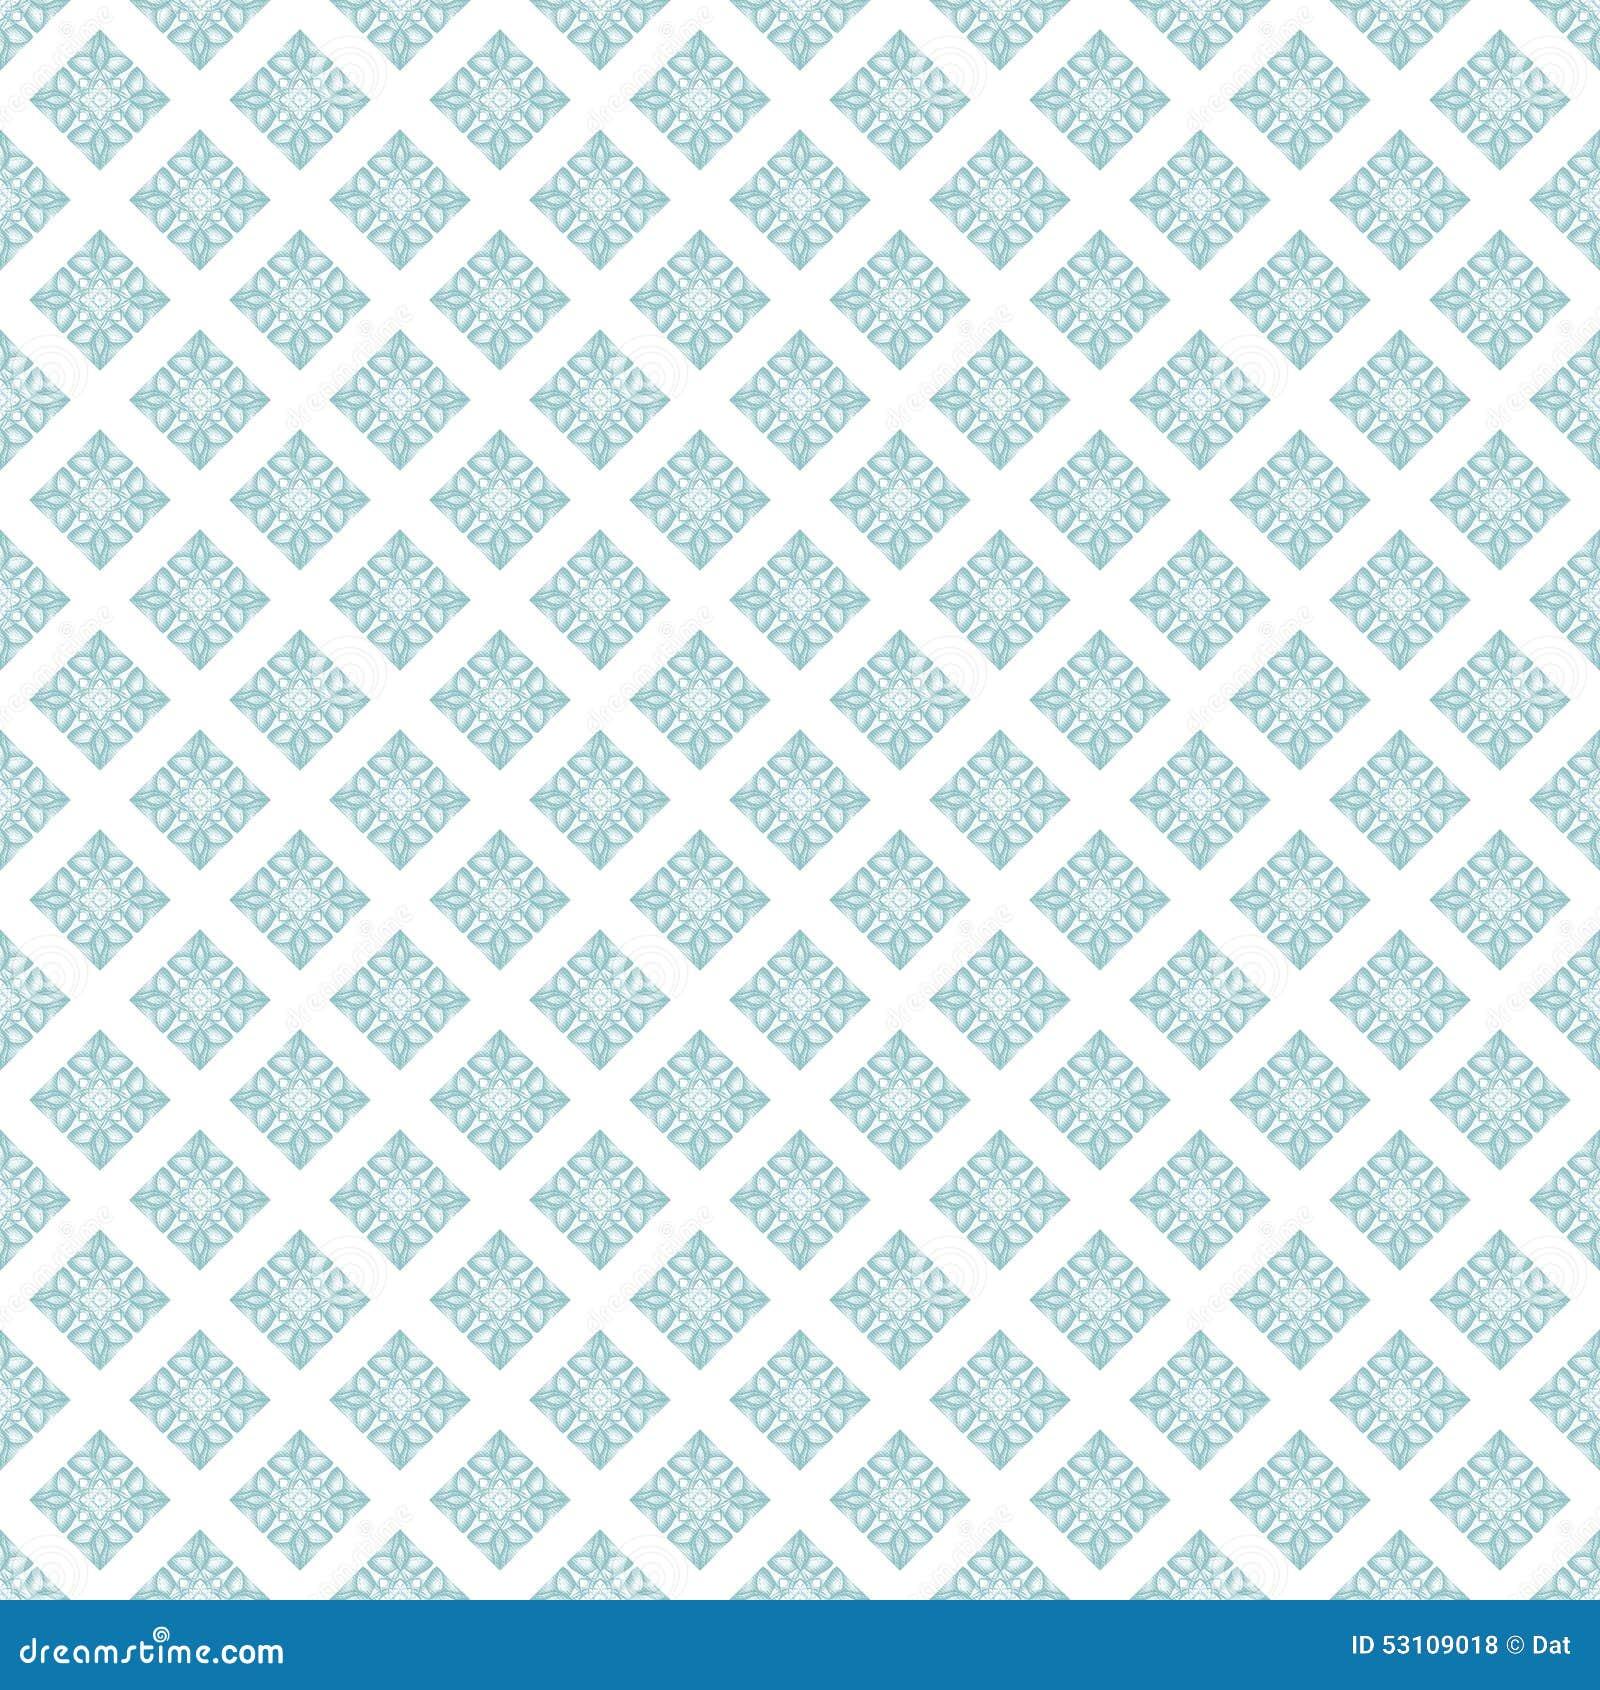 Mint green pattern